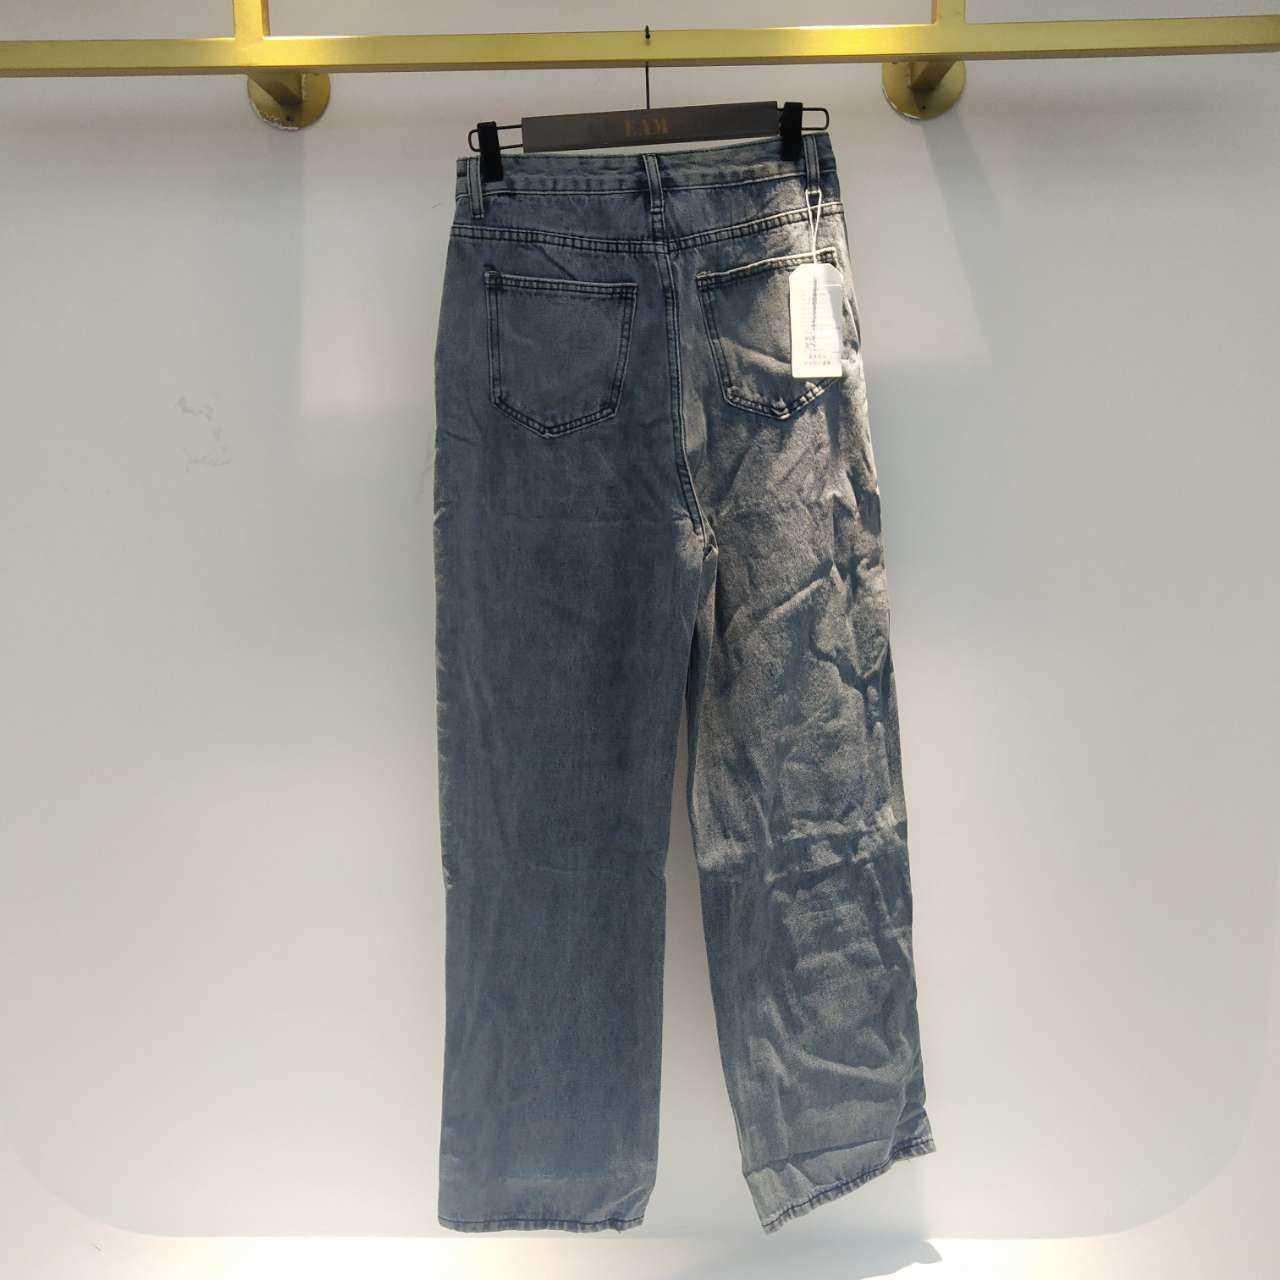 SHENGPALAE 2021 New Summer Vintage Jeans Woman Long Trousers Cowboy Female Loose Streetwear Butterfly Print Pants ZA4110